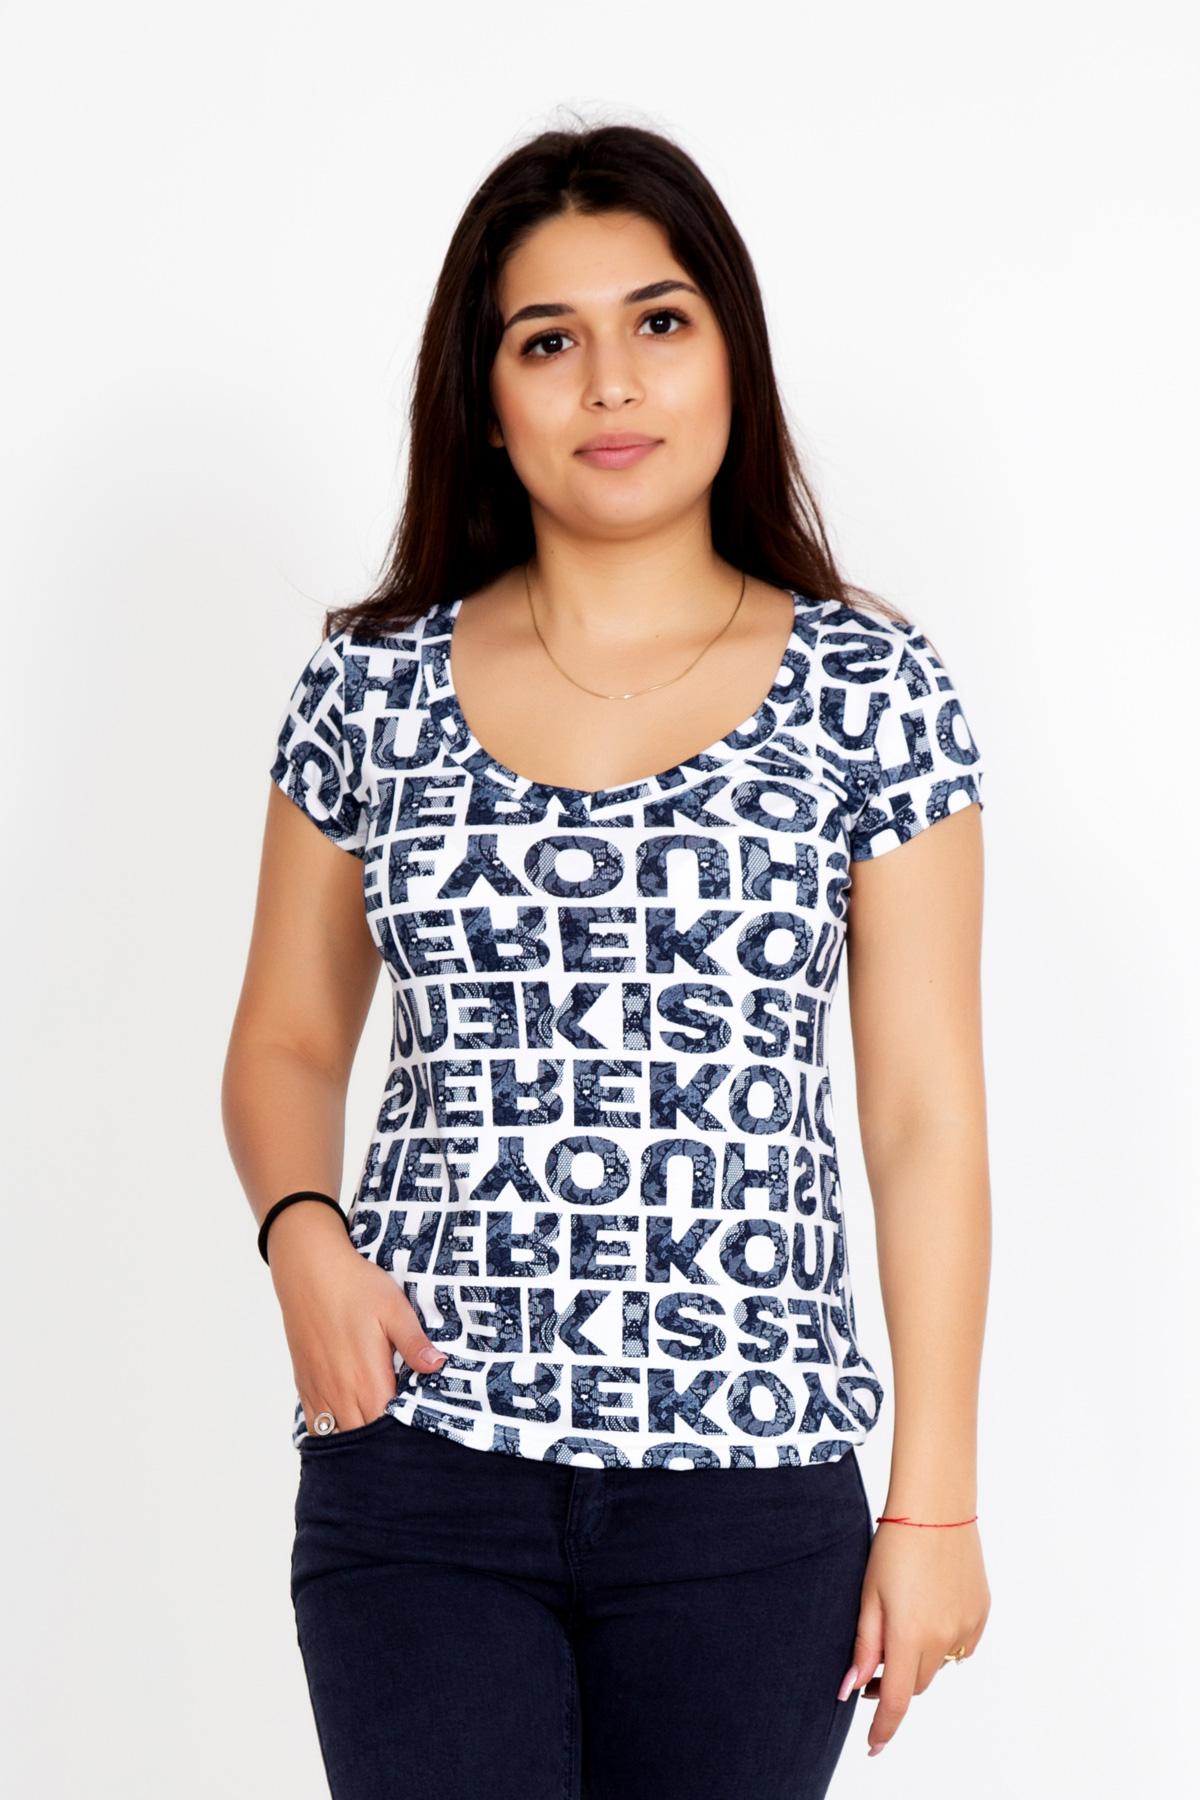 Жен. футболка Лиза р. 44Майки и футболки<br>Факт. ОГ: 76 см <br>Факт. ОТ: 76 см <br>Факт. ОБ: 84 см <br>Длина по спинке: 59 см<br><br>Тип: Жен. футболка<br>Размер: 44<br>Материал: Фулайкра